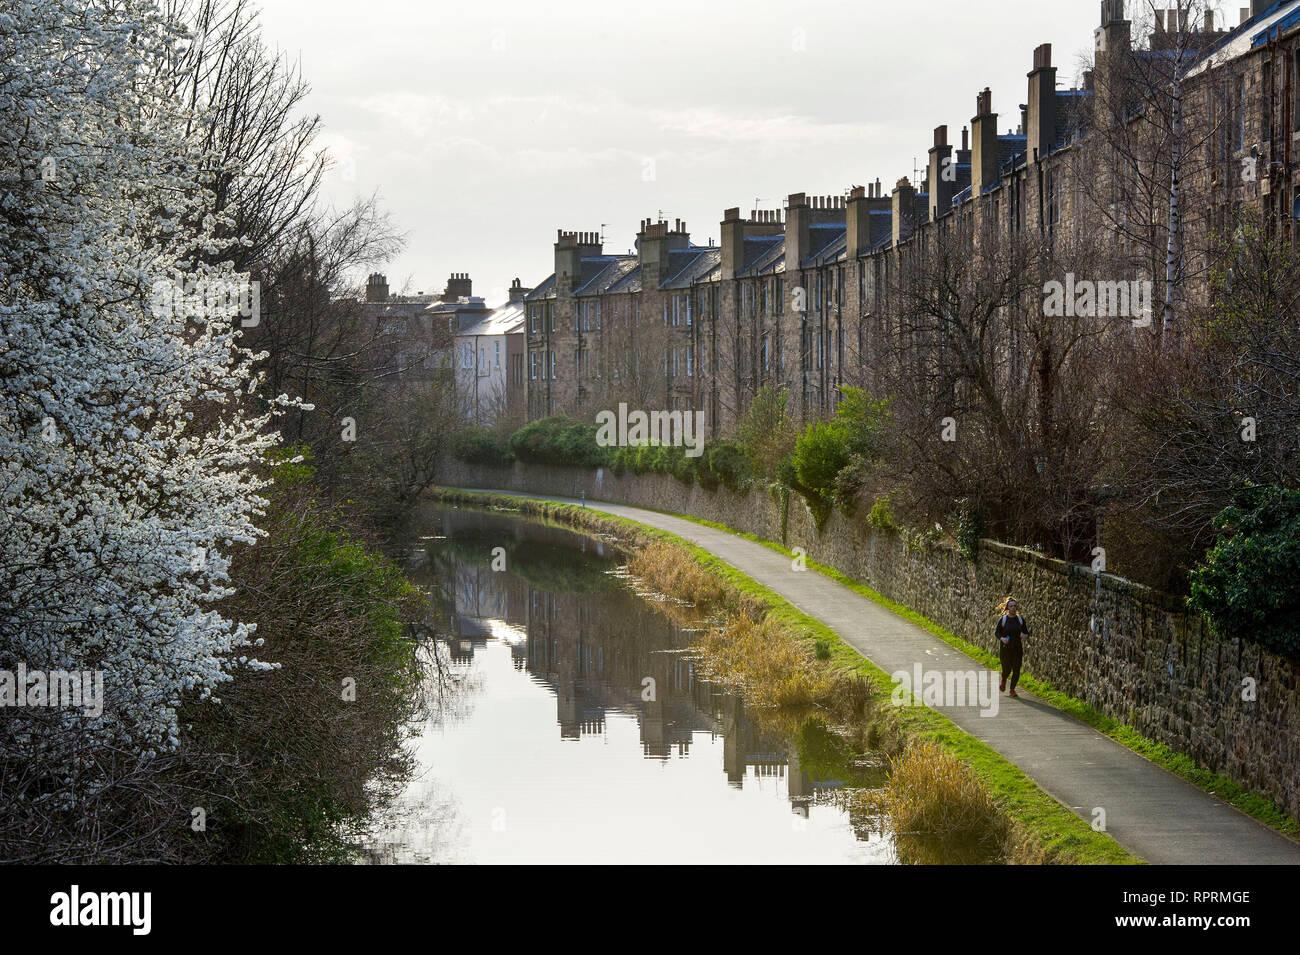 The Union canal at Viewforth, Edinburgh. - Stock Image